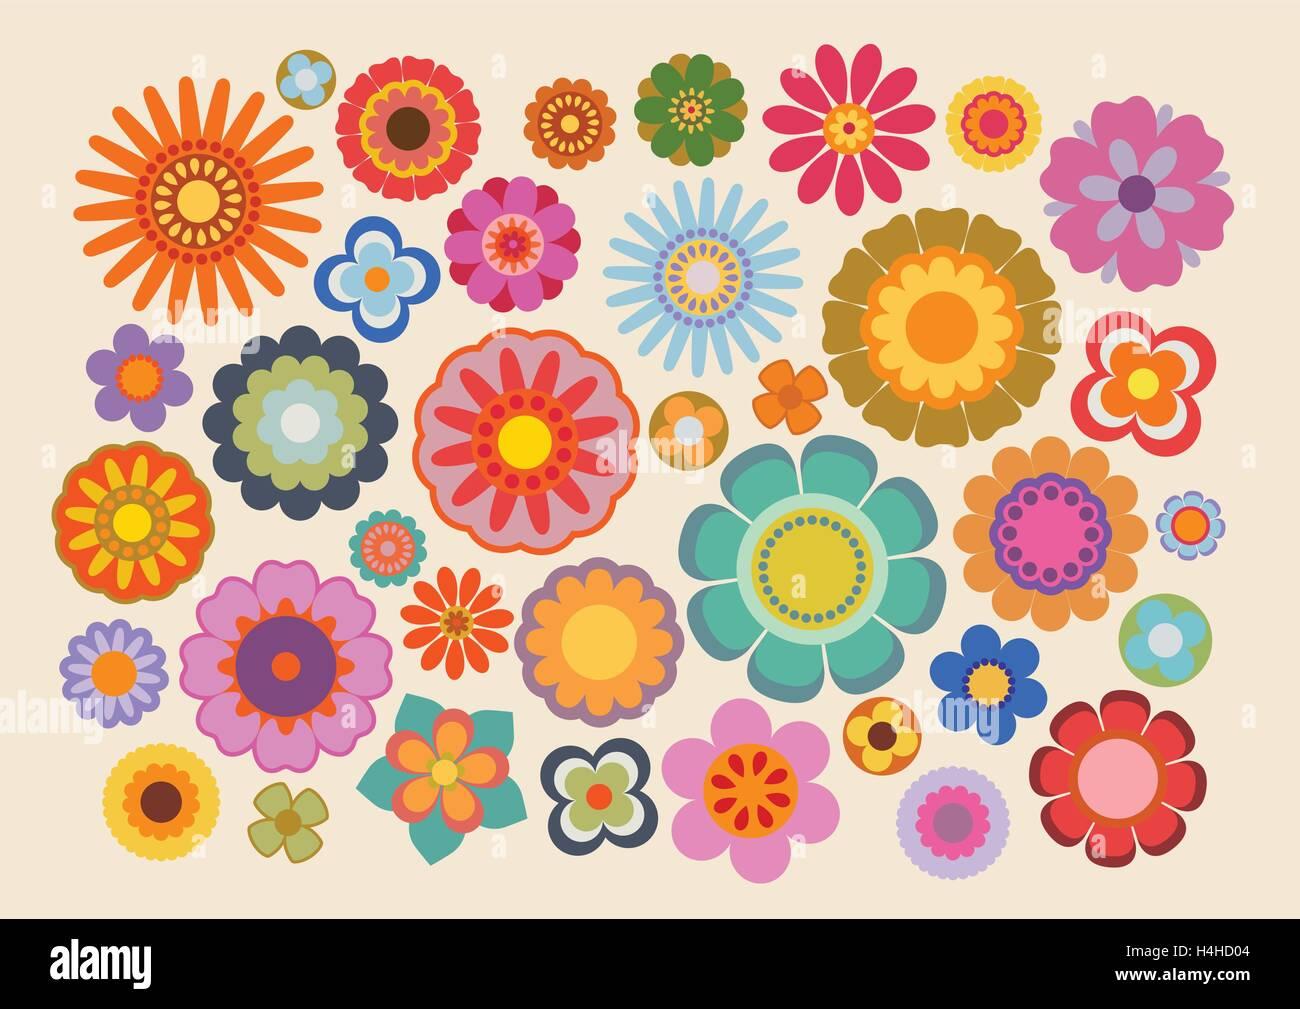 Vintage flowers (part 4) - Stock Image